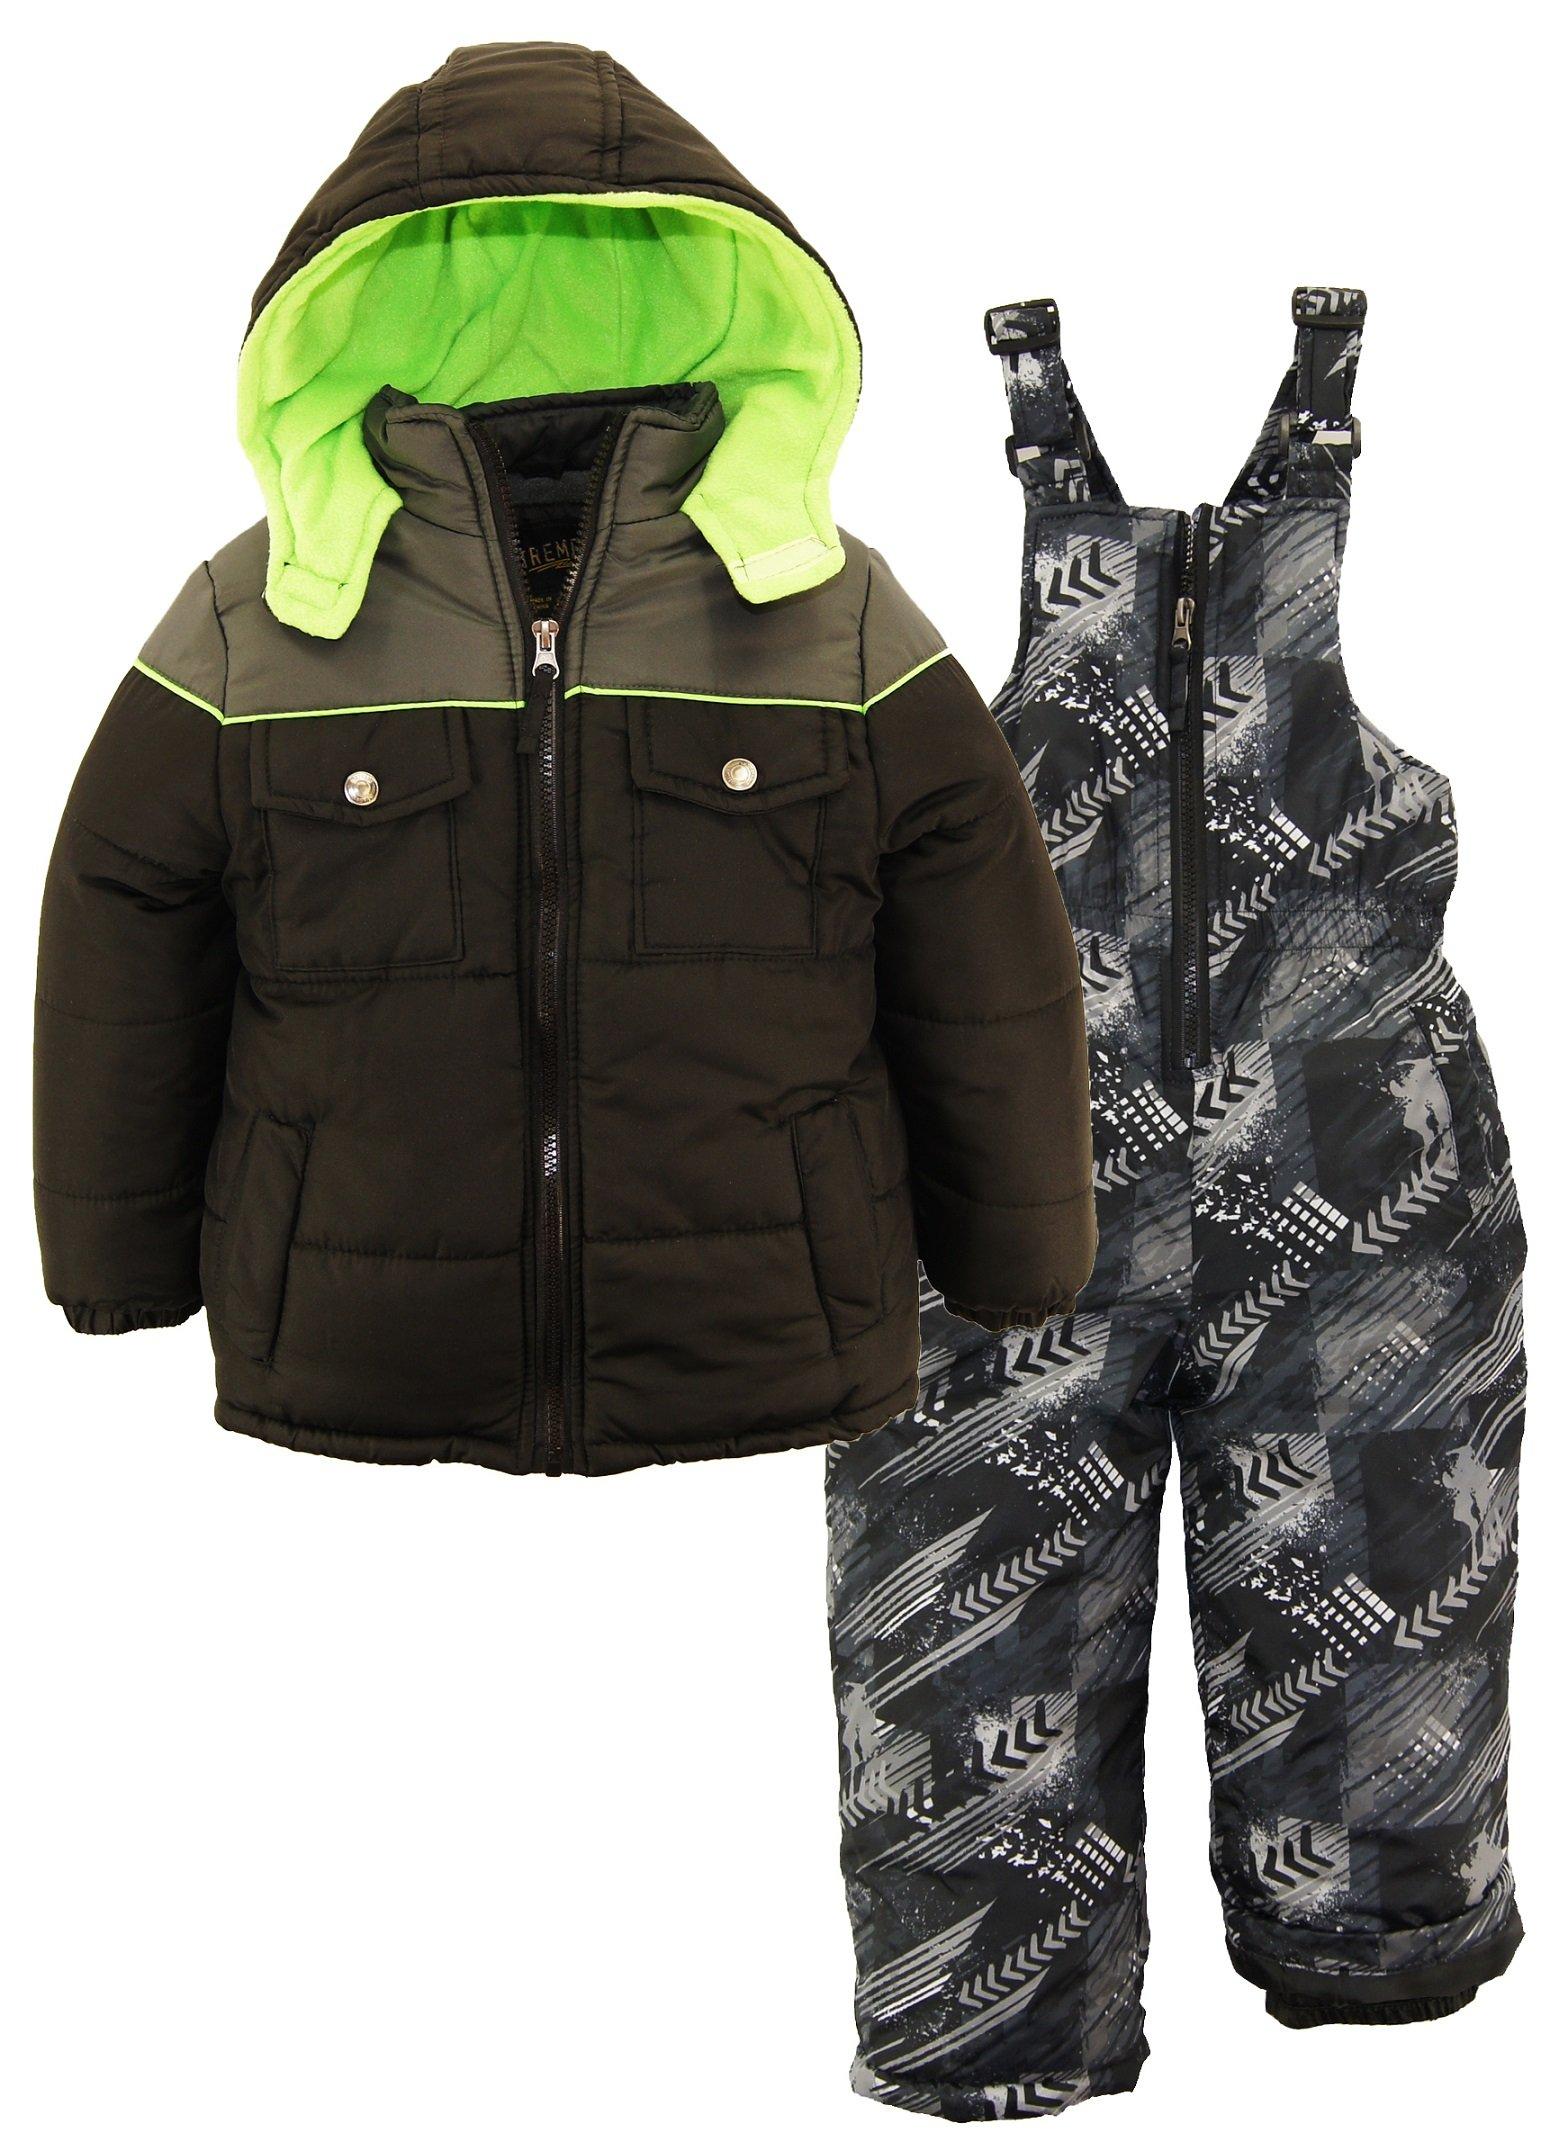 Ixtreme 2-Piece Snowsuit For Boys, Infants & Toddlers – Camo Print Bottoms